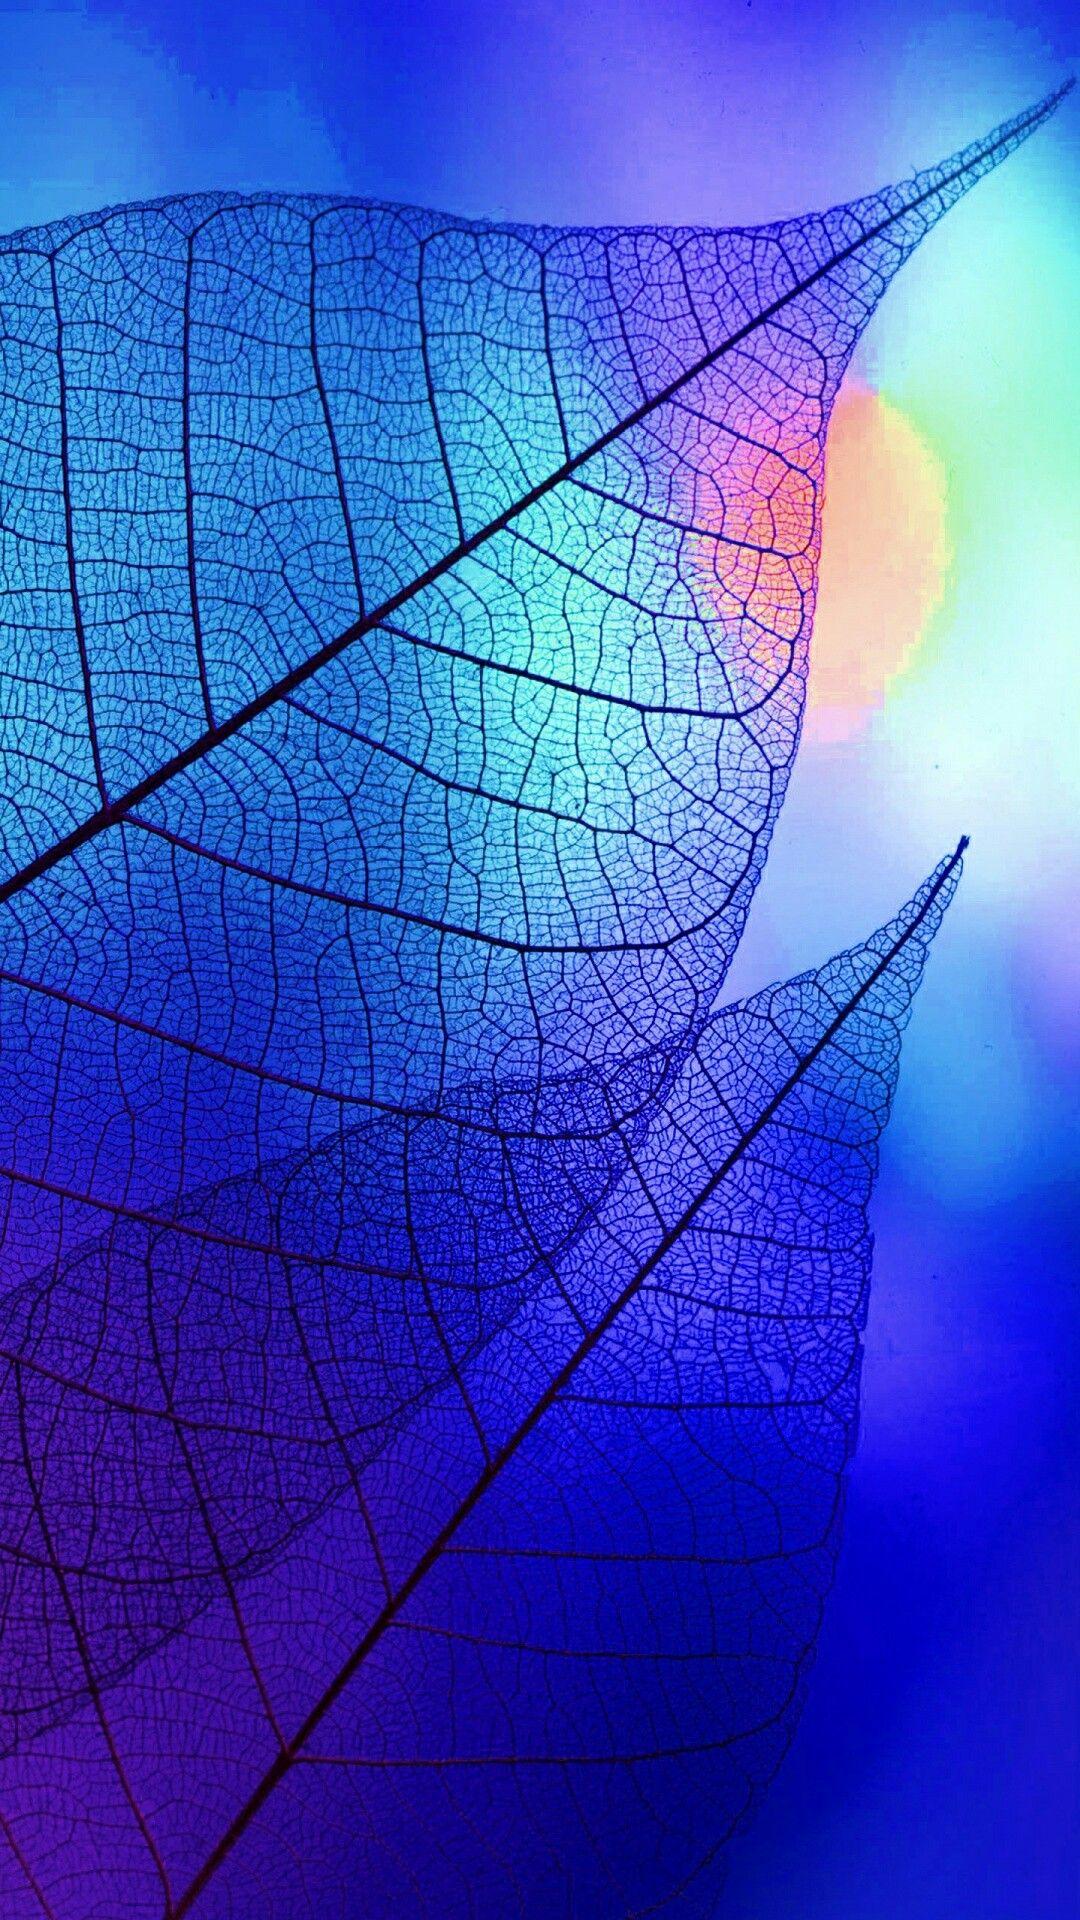 Leaves Blue Drawings Colorful Wallpaper Best Iphone Wallpapers